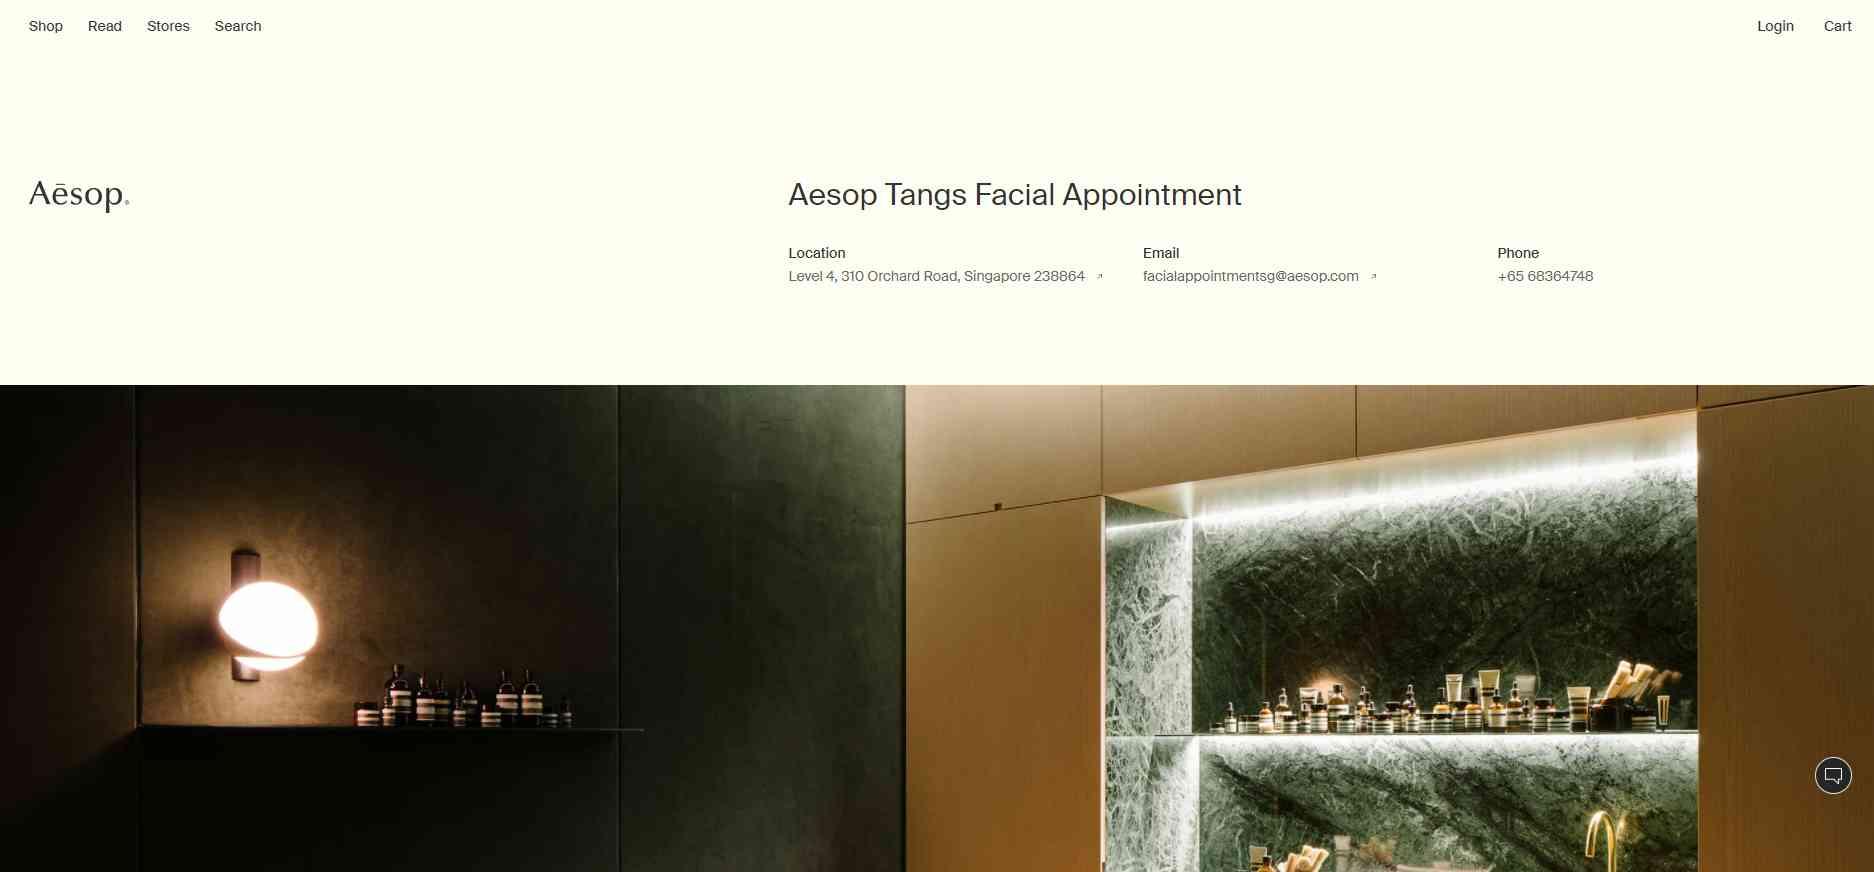 aesop Top Facial Salons in Singapore